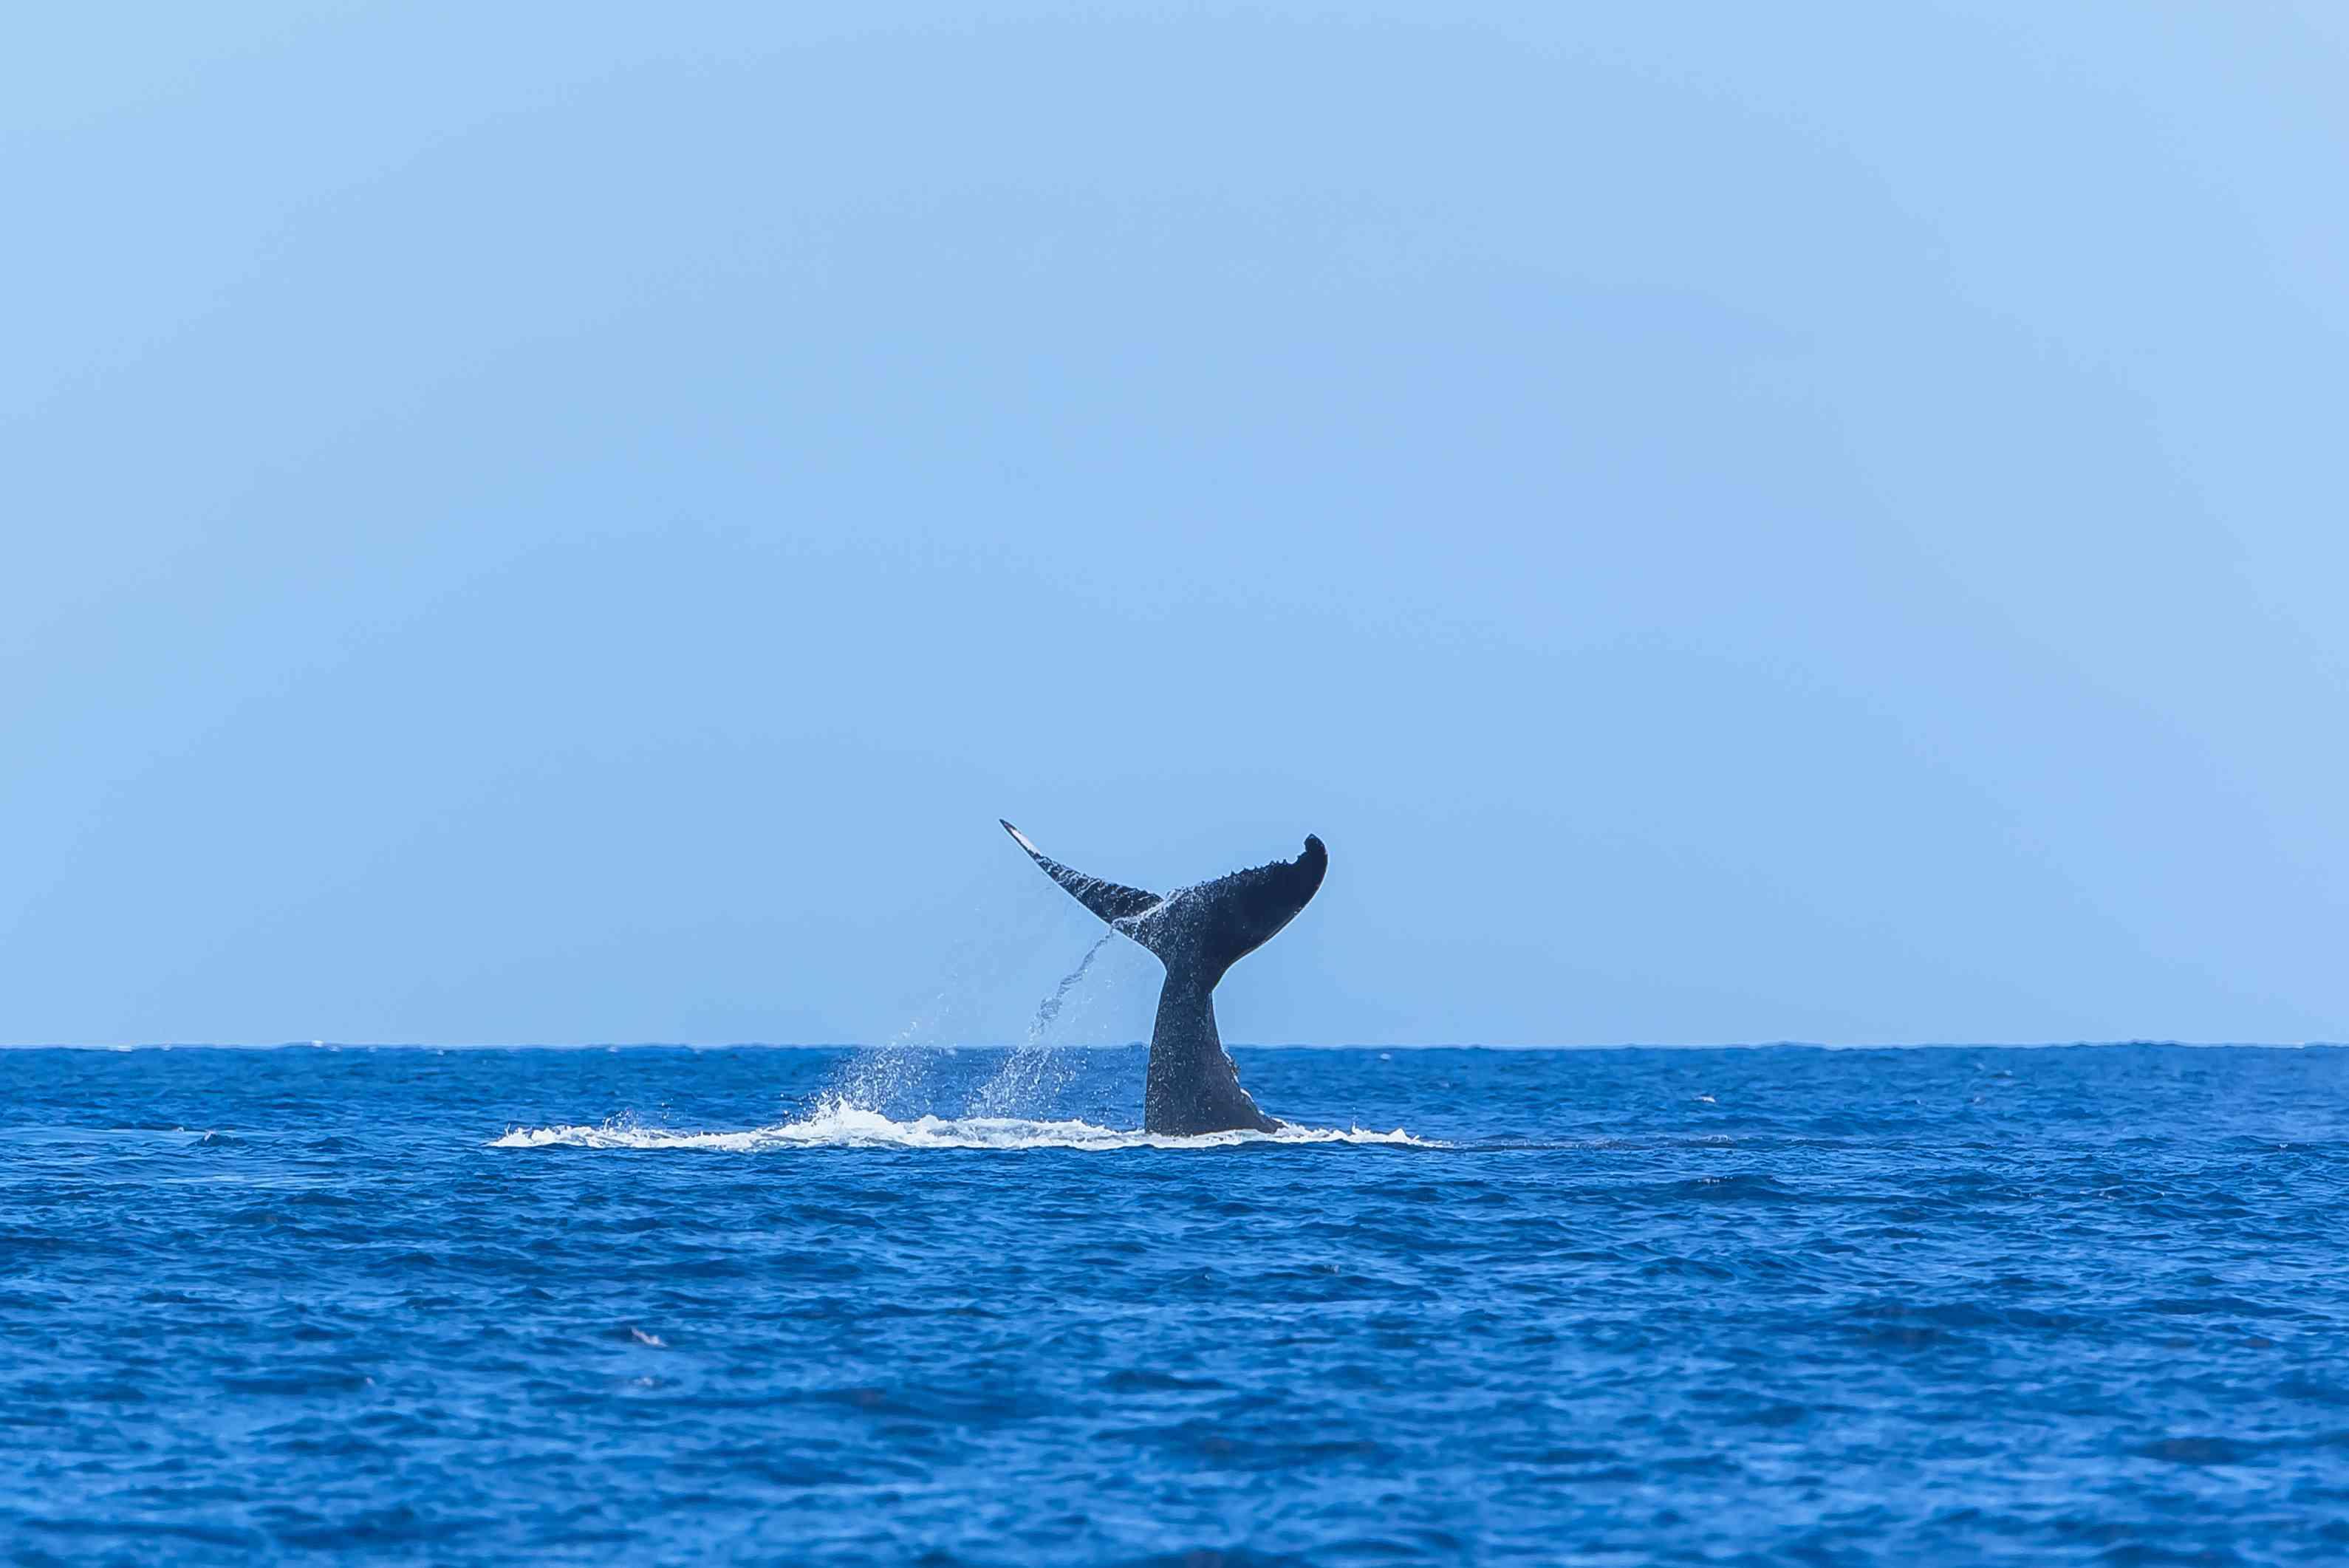 Humpback whale swimming